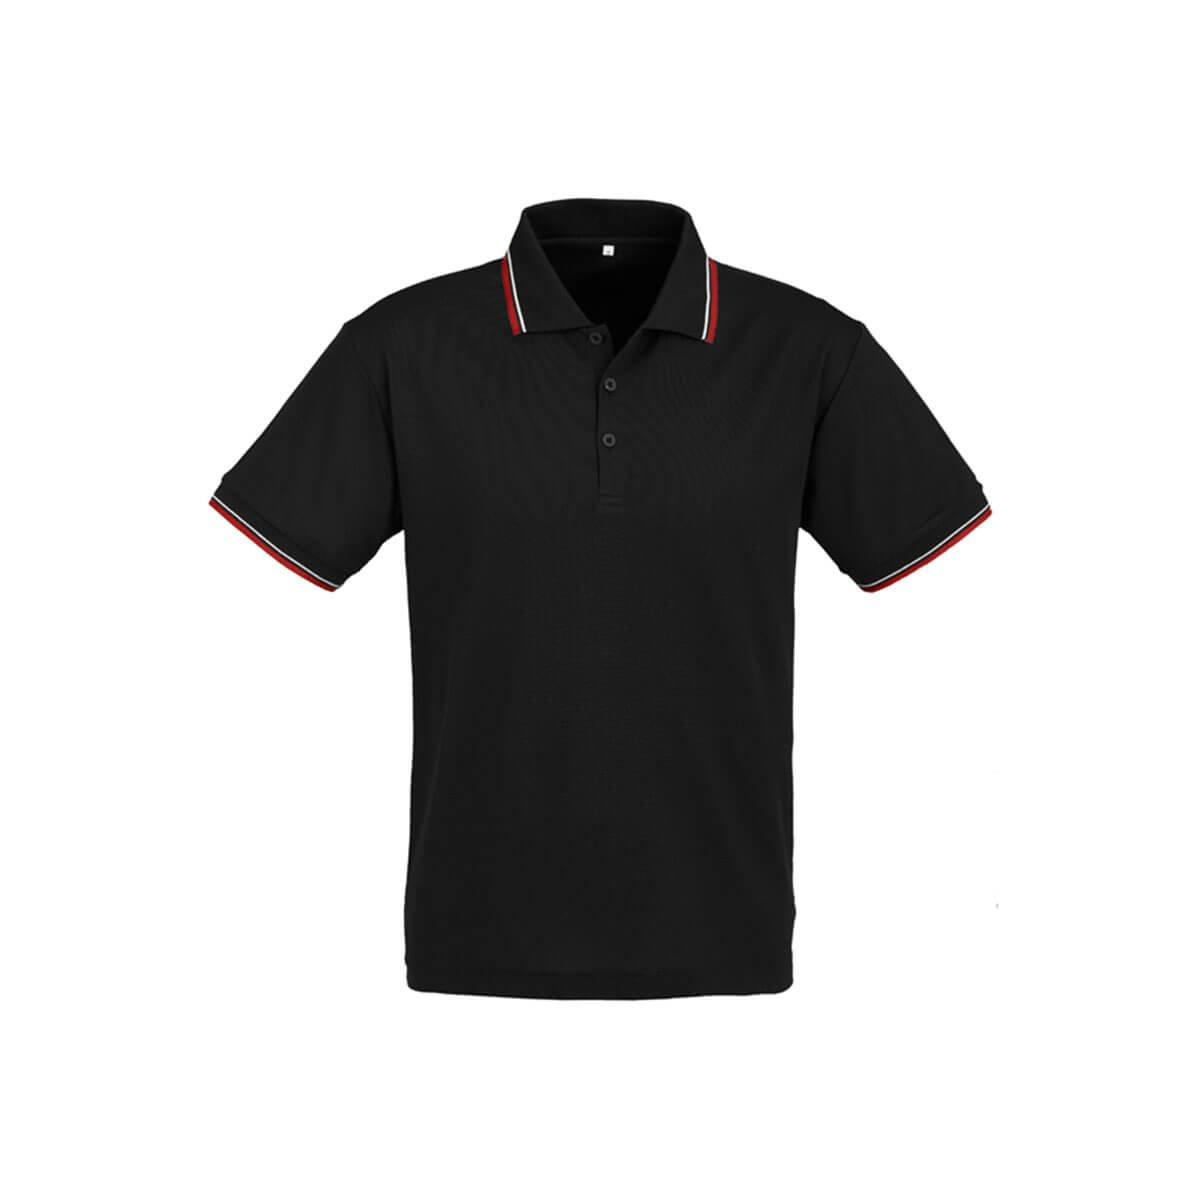 Mens Cambridge Polo-Black / Red / White